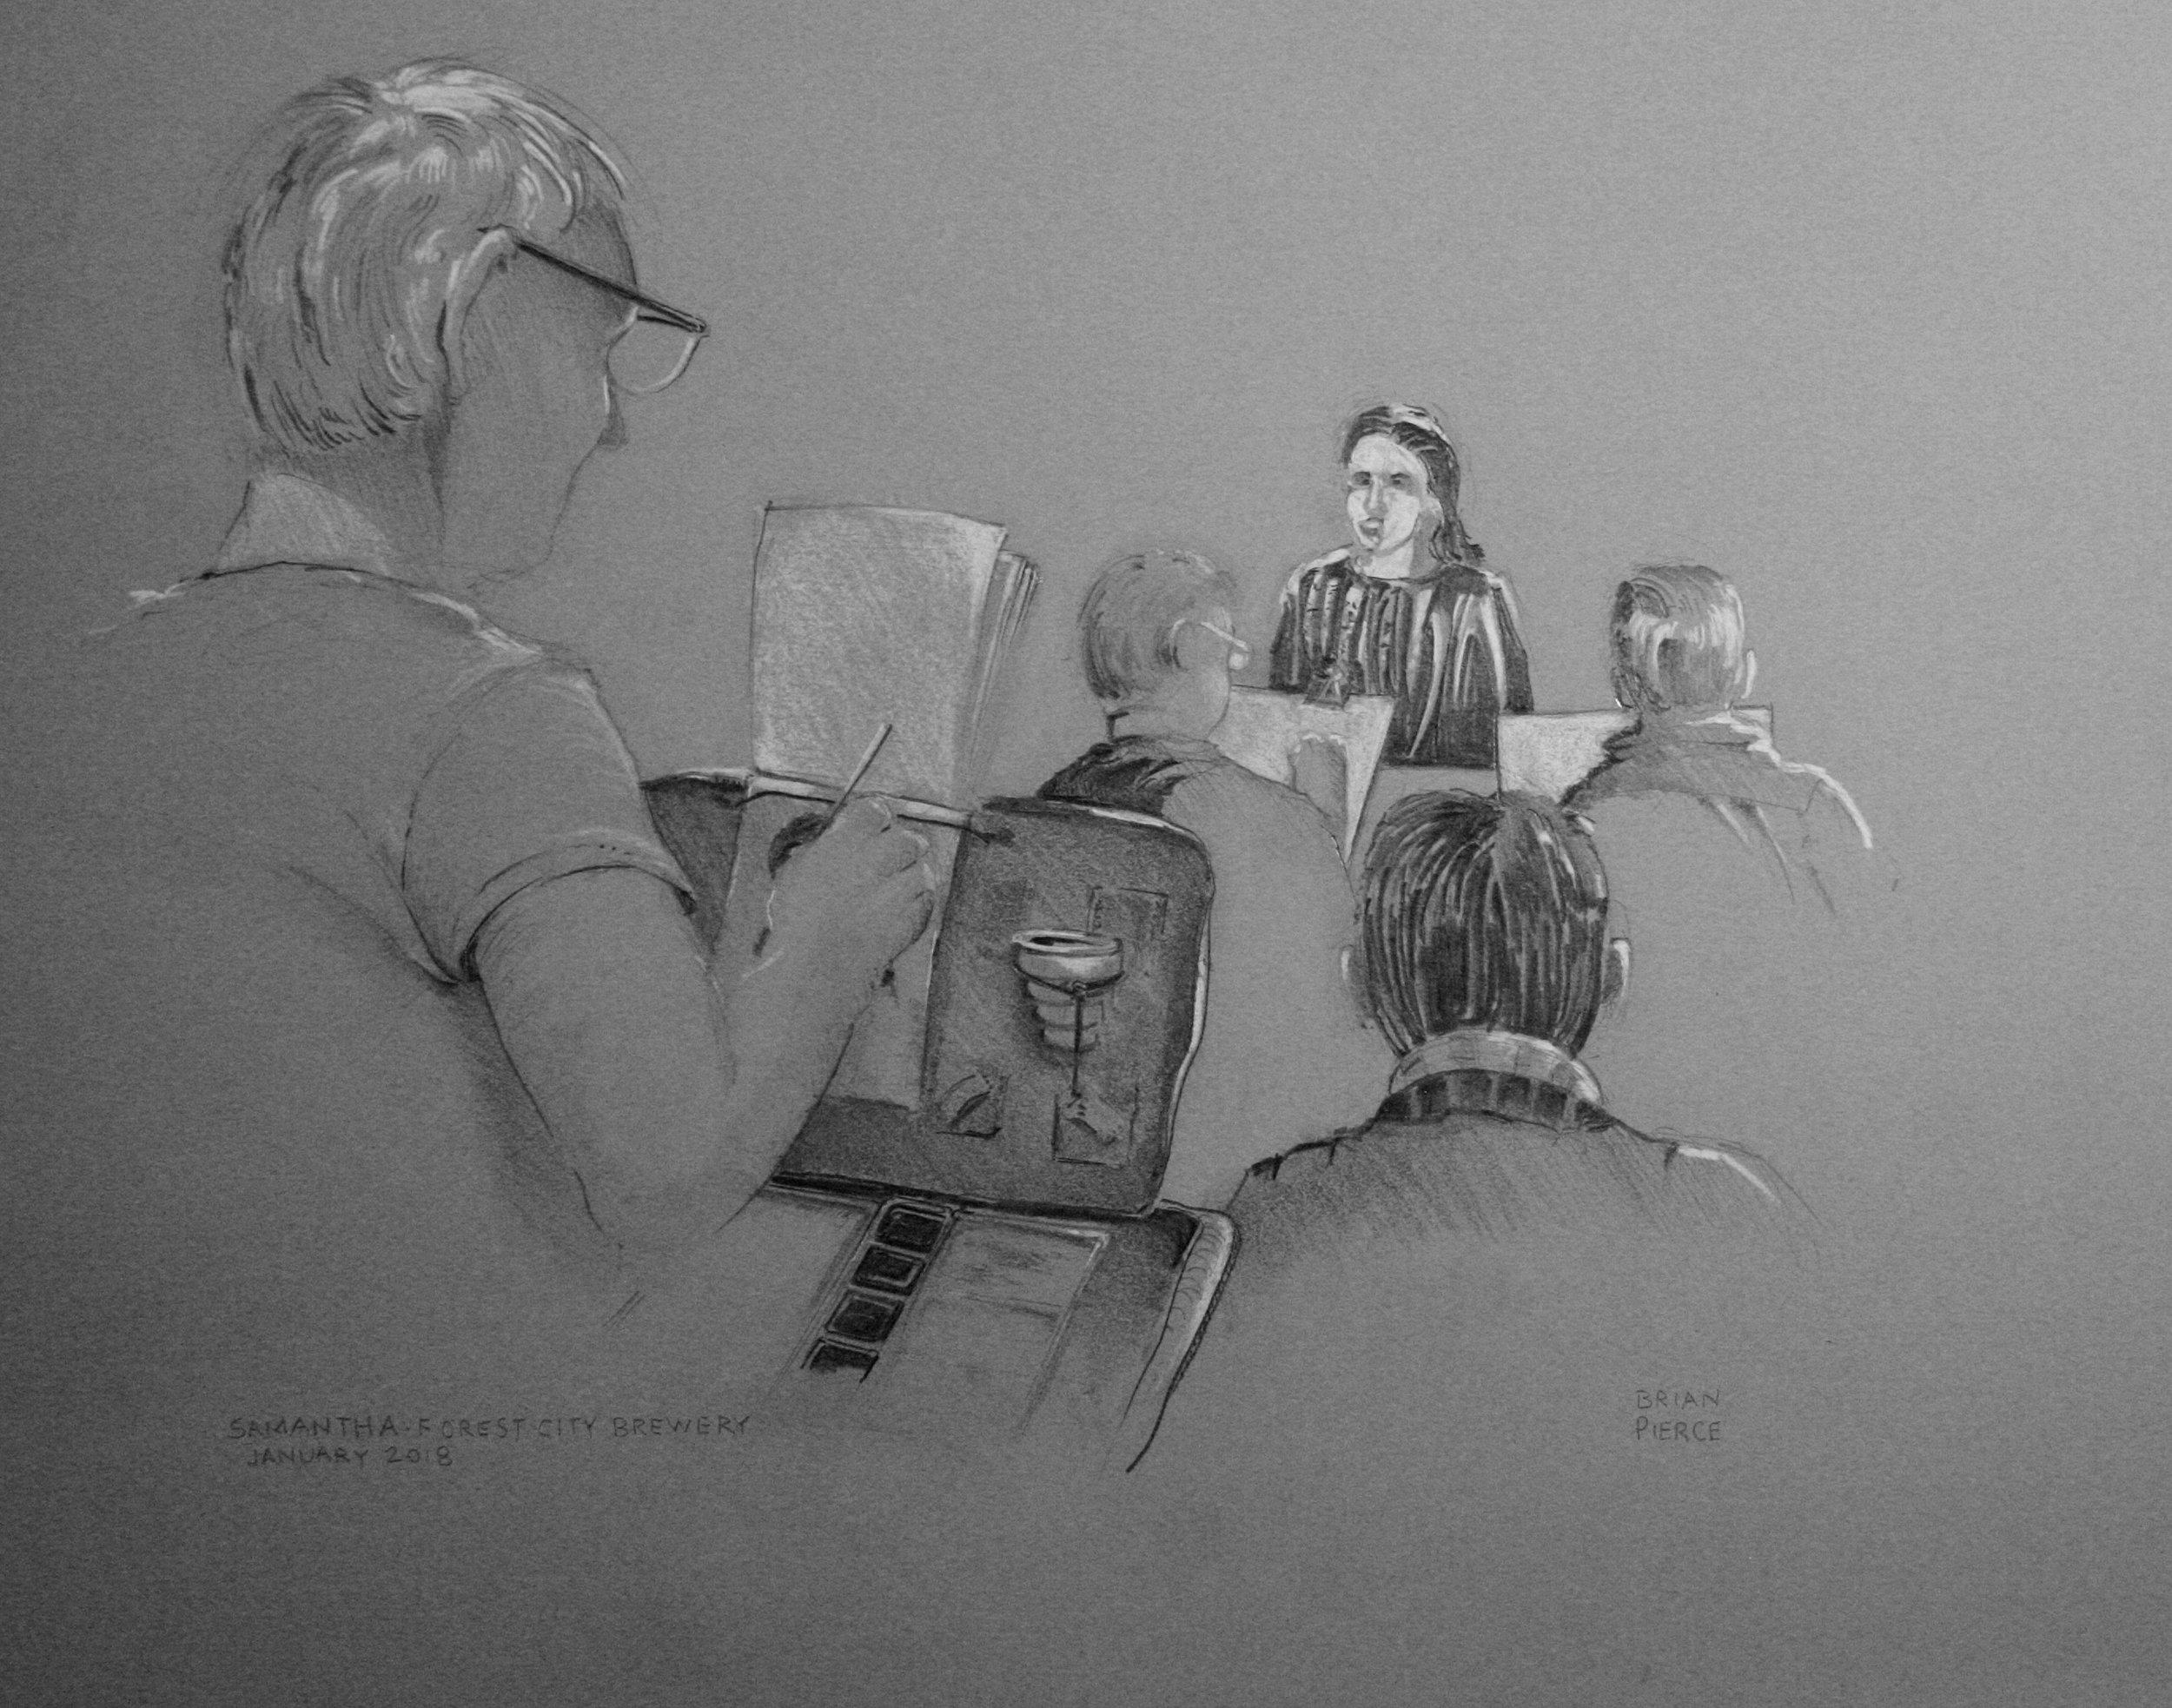 Brian Pierce did this drawing of the PCPA drawing Samantha.